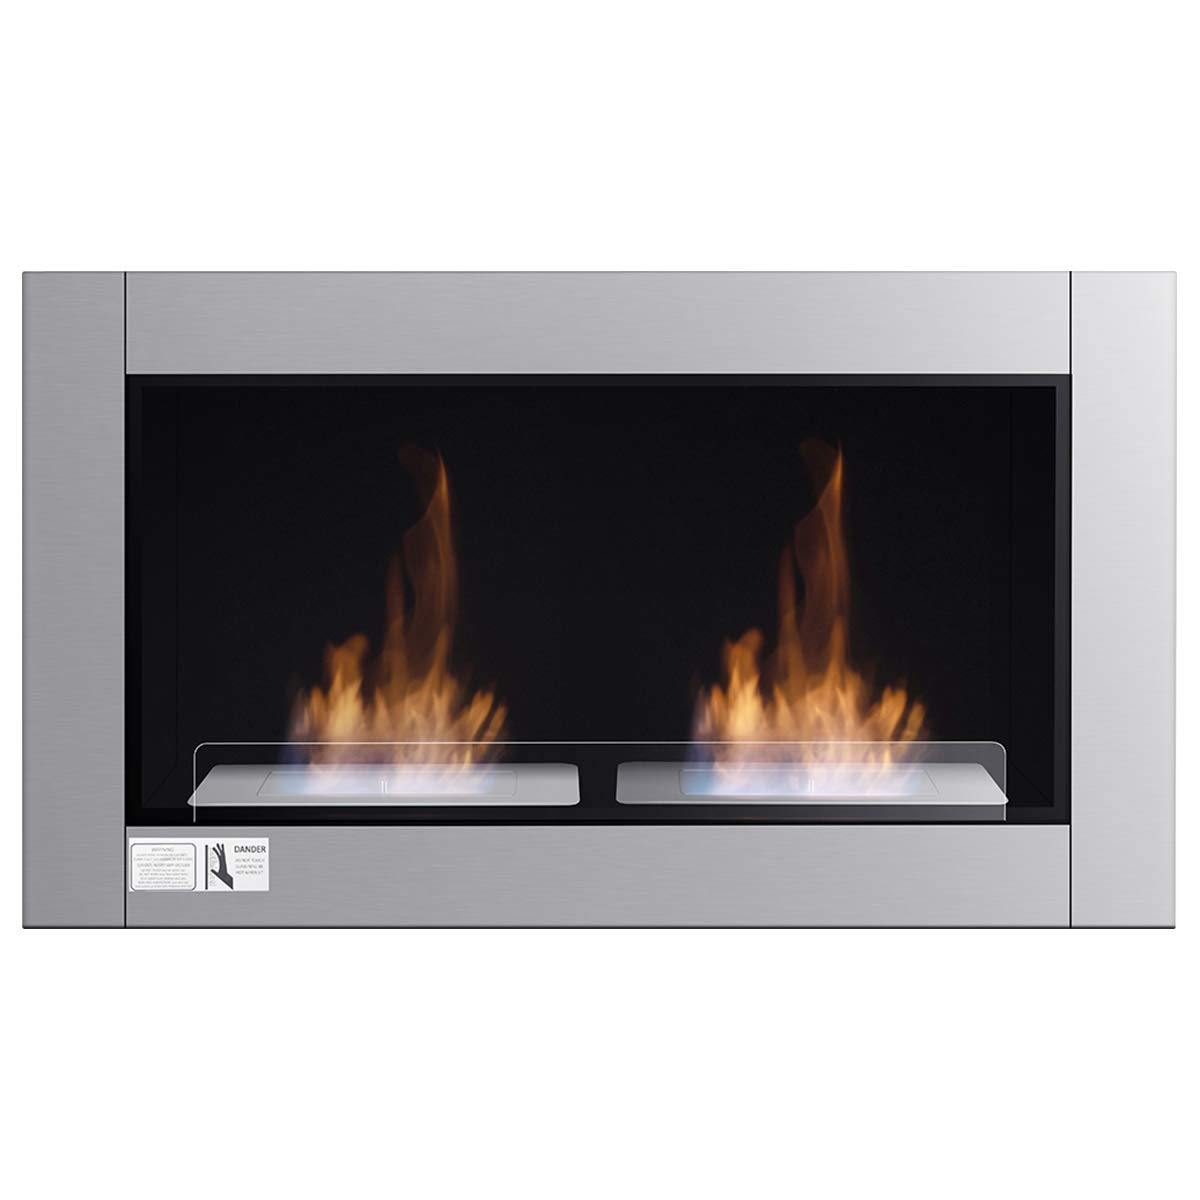 Tangkula 38'' Wall Mounted Fireplace Dual Burner Bio-Ethanol Fireplace Ventless Hanging Fireplace Tabletop Fireplace by Tangkula